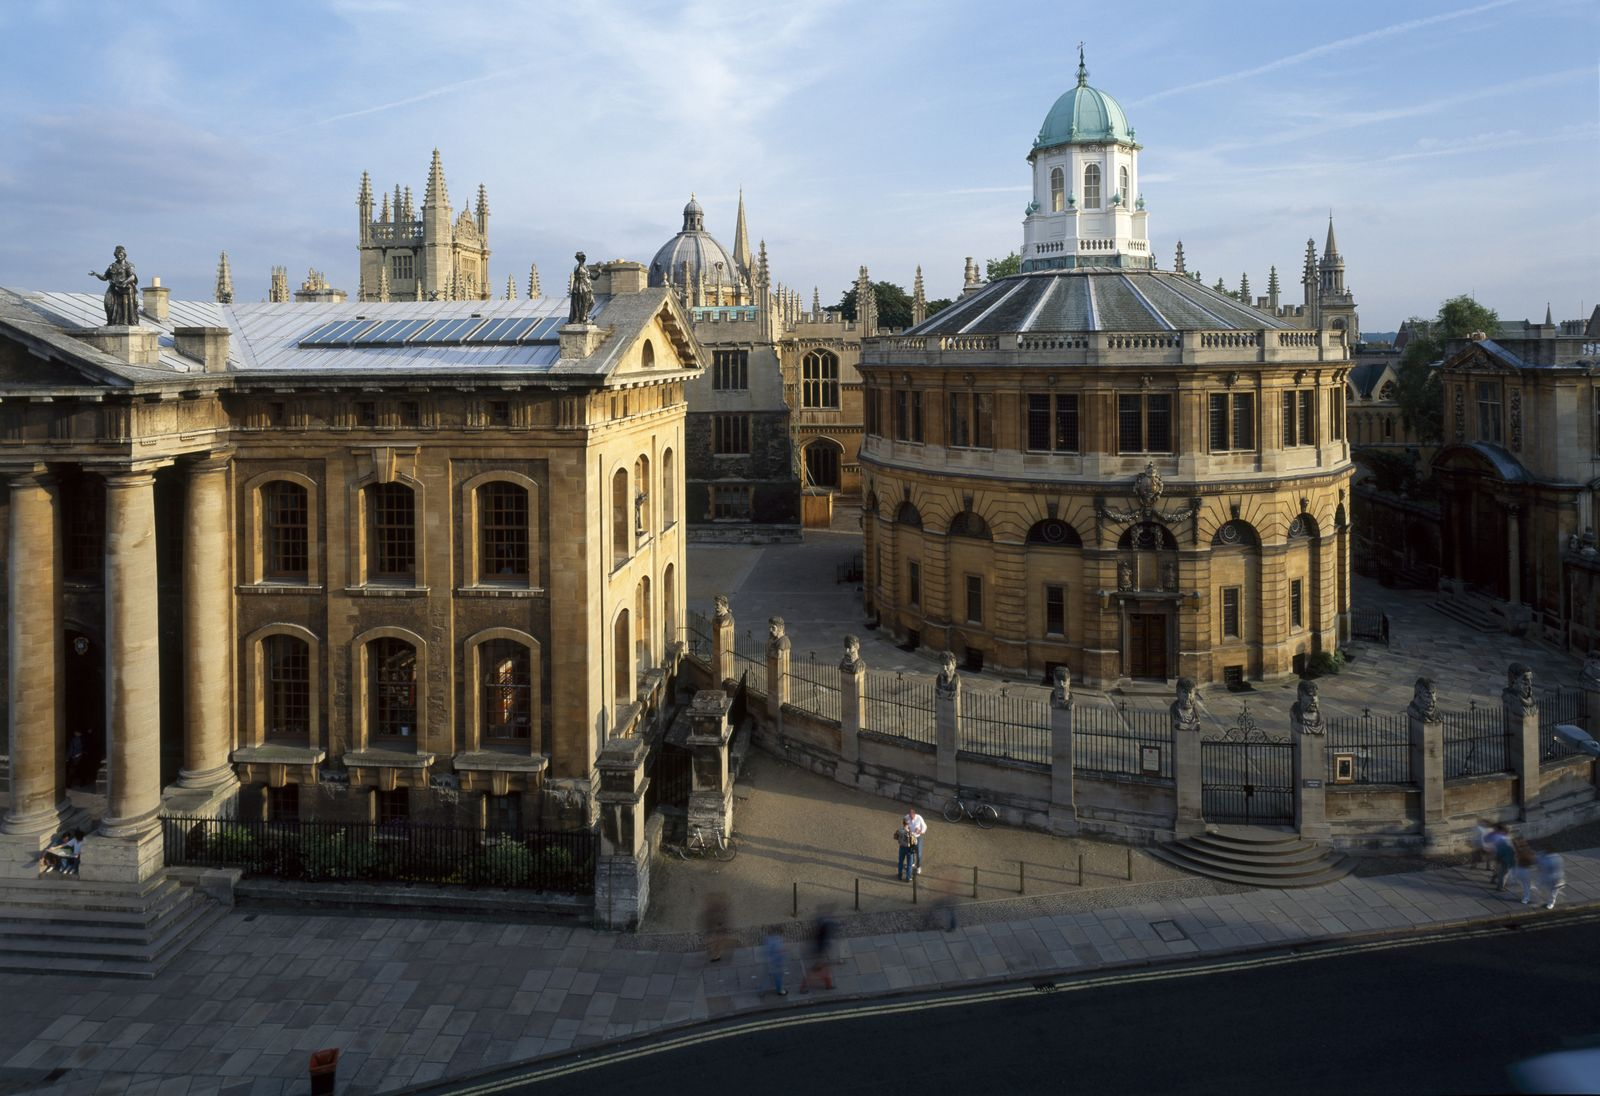 Sheldonian Theatre, Broad St, Oxford, England, 1662 - 1669